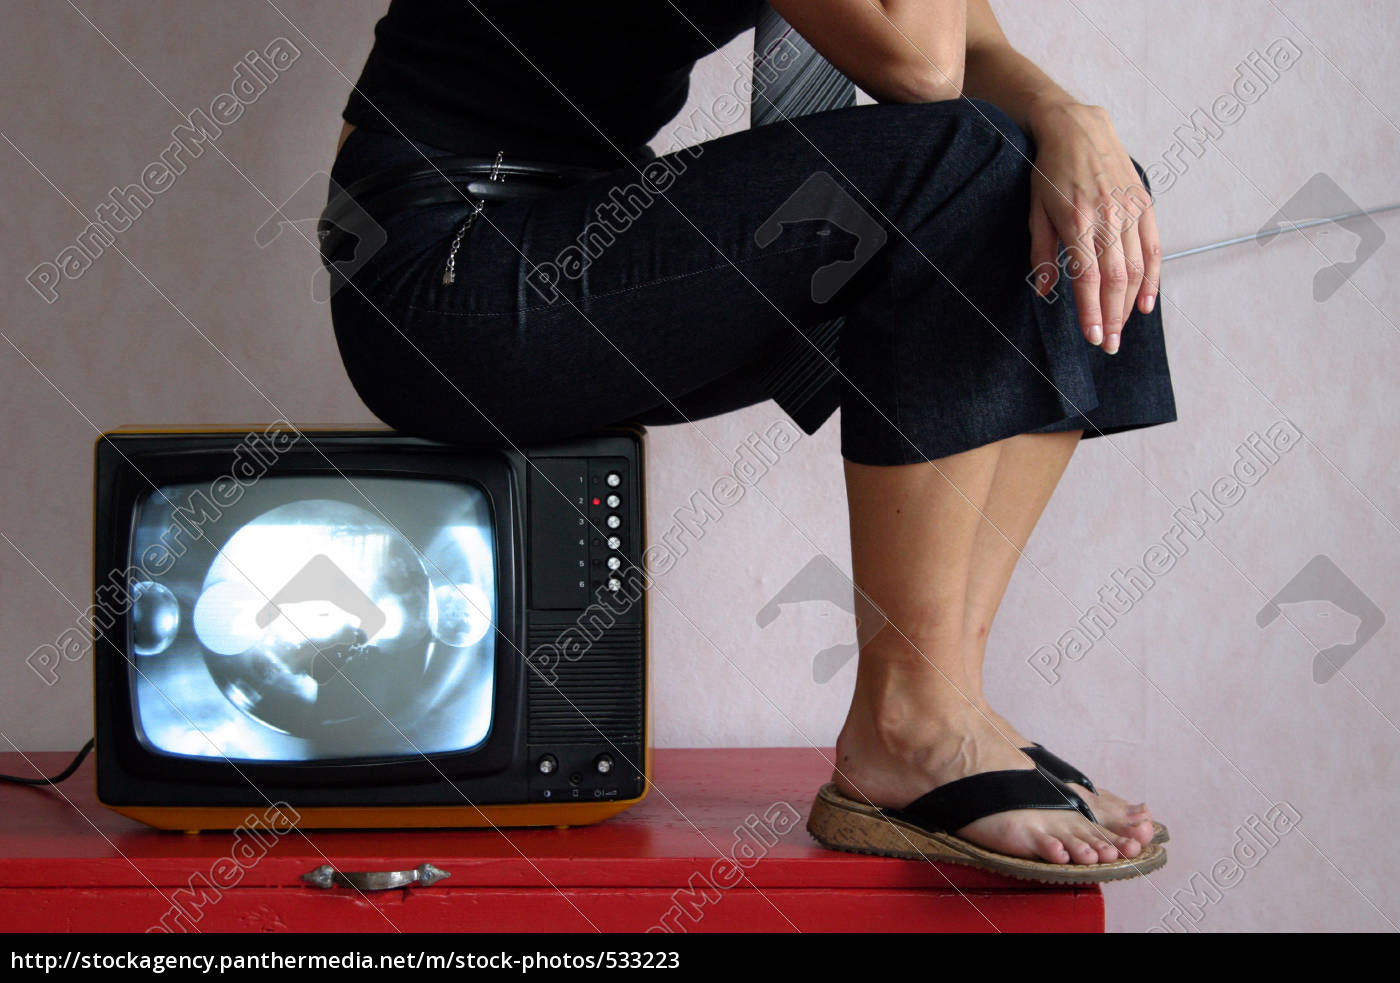 tv - 533223